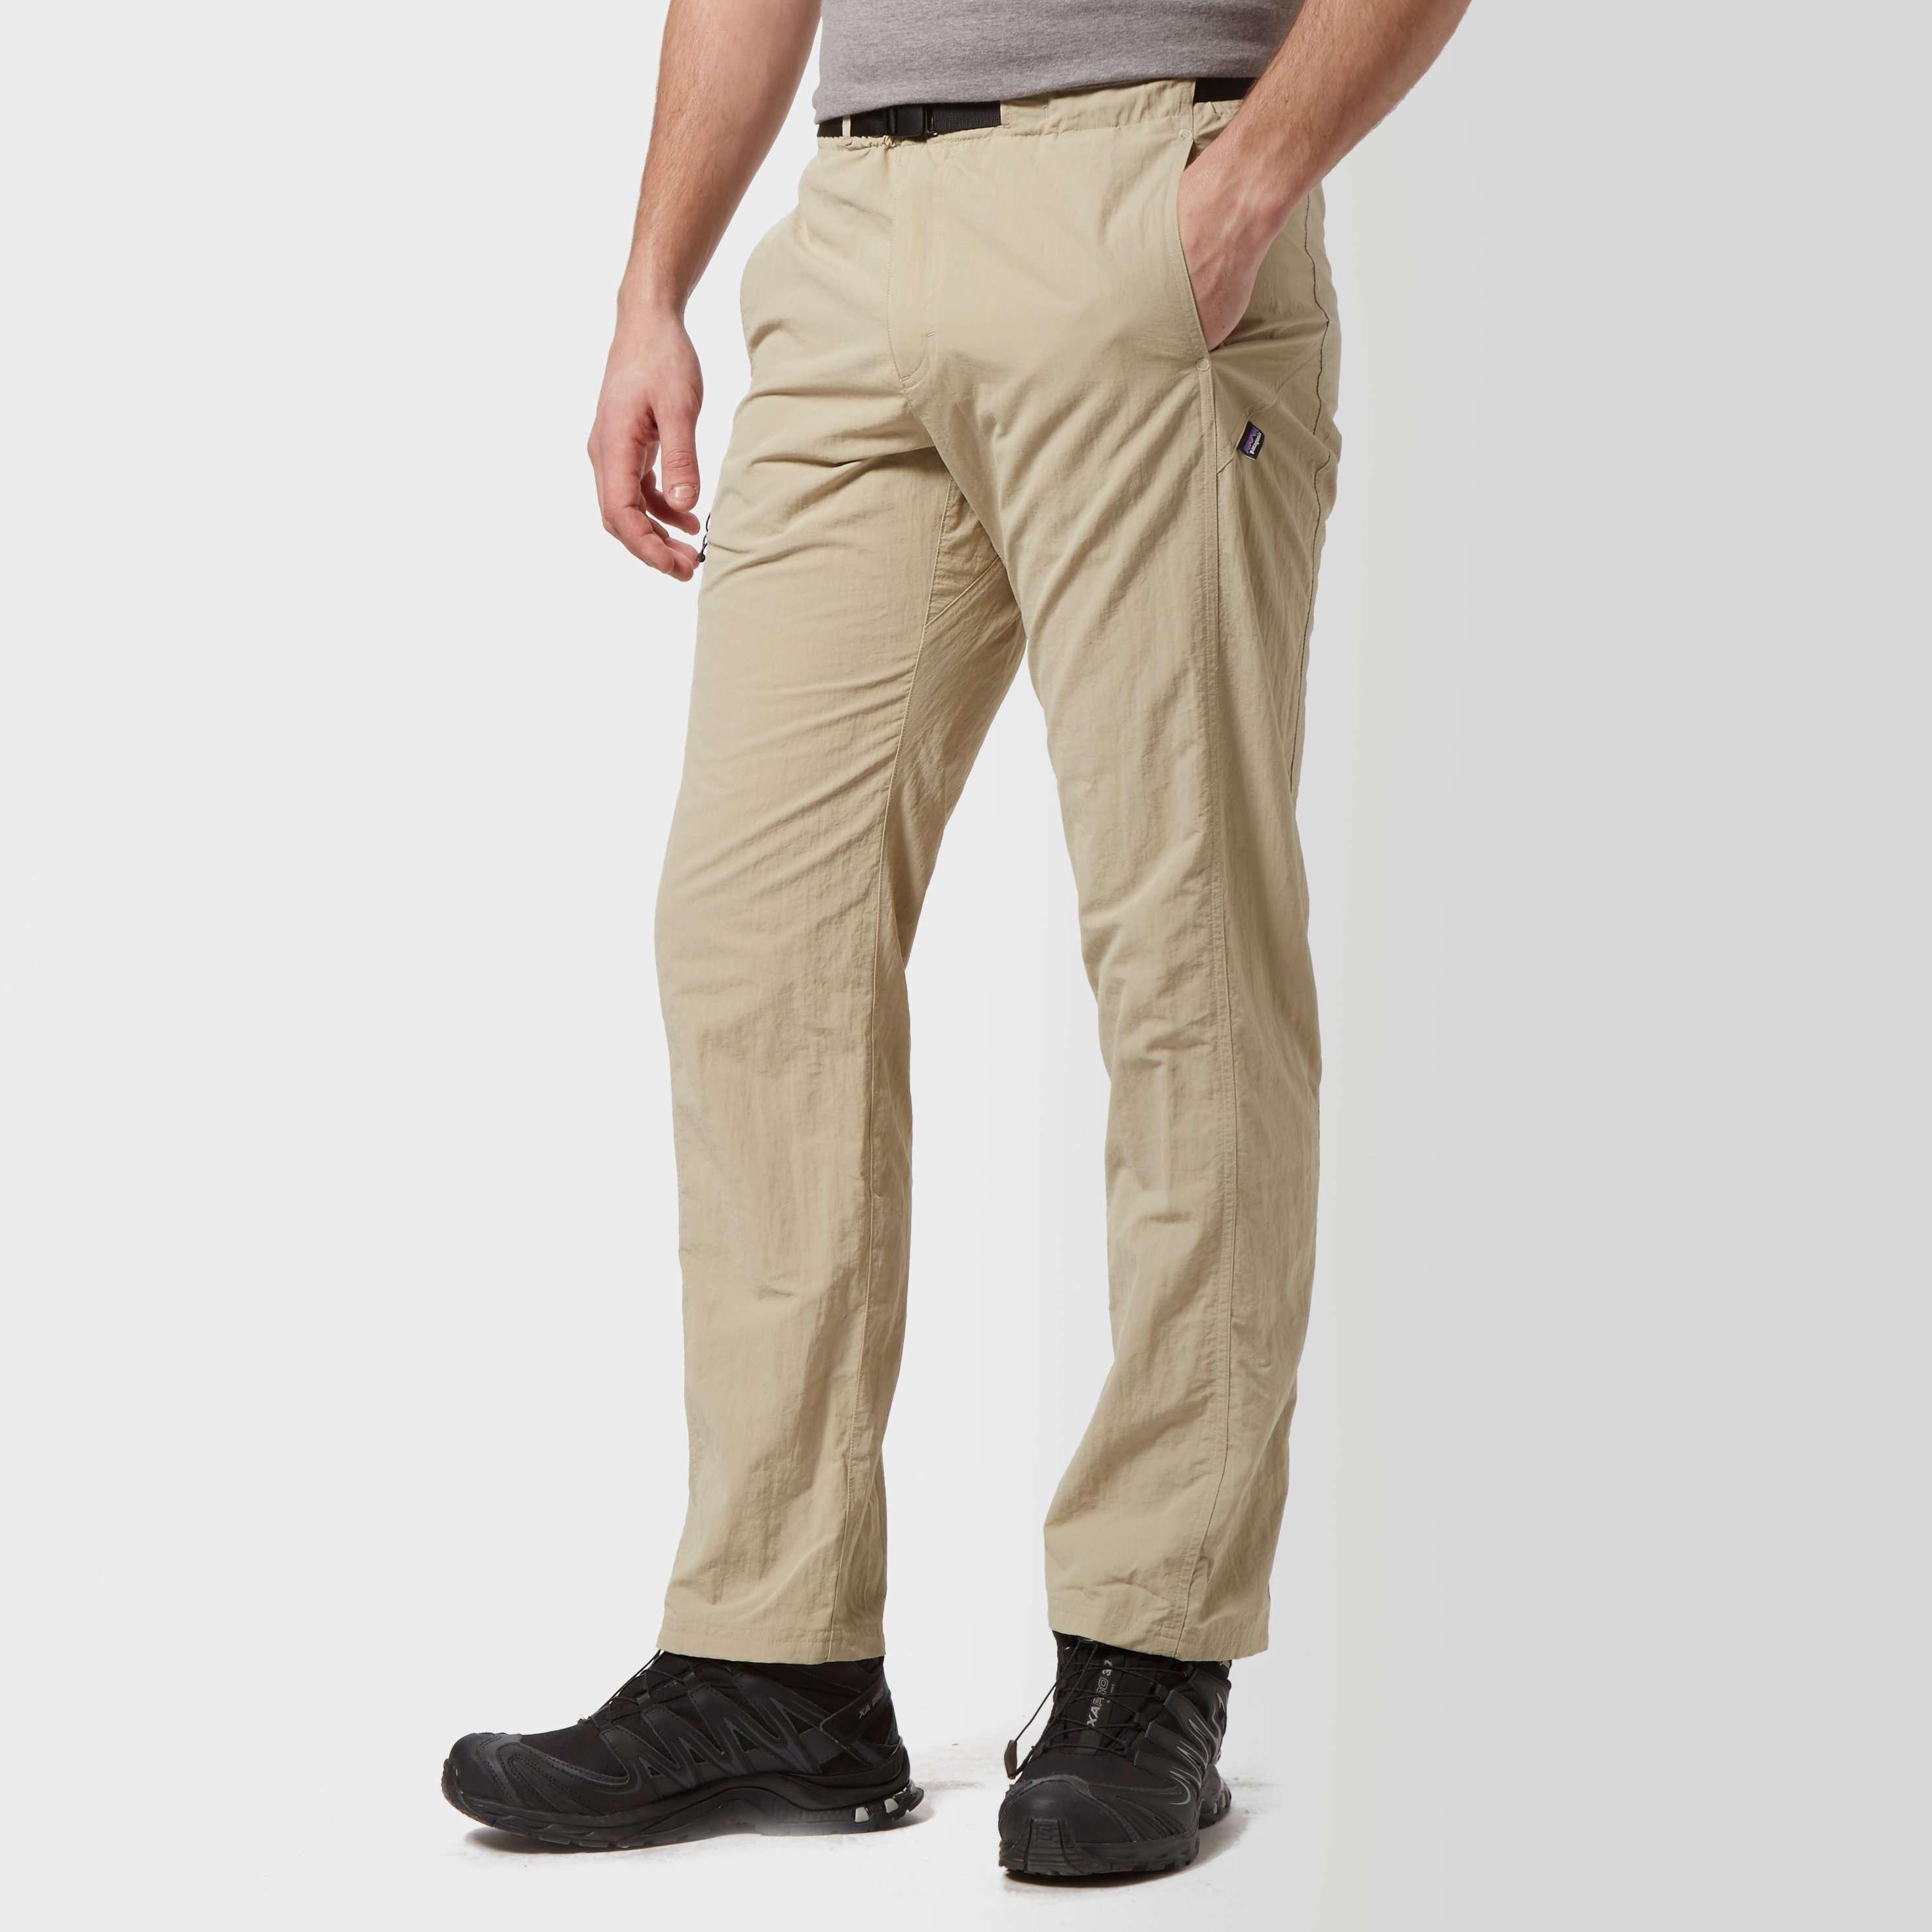 PATAGONIA Men's Gi III Pants (Regular)